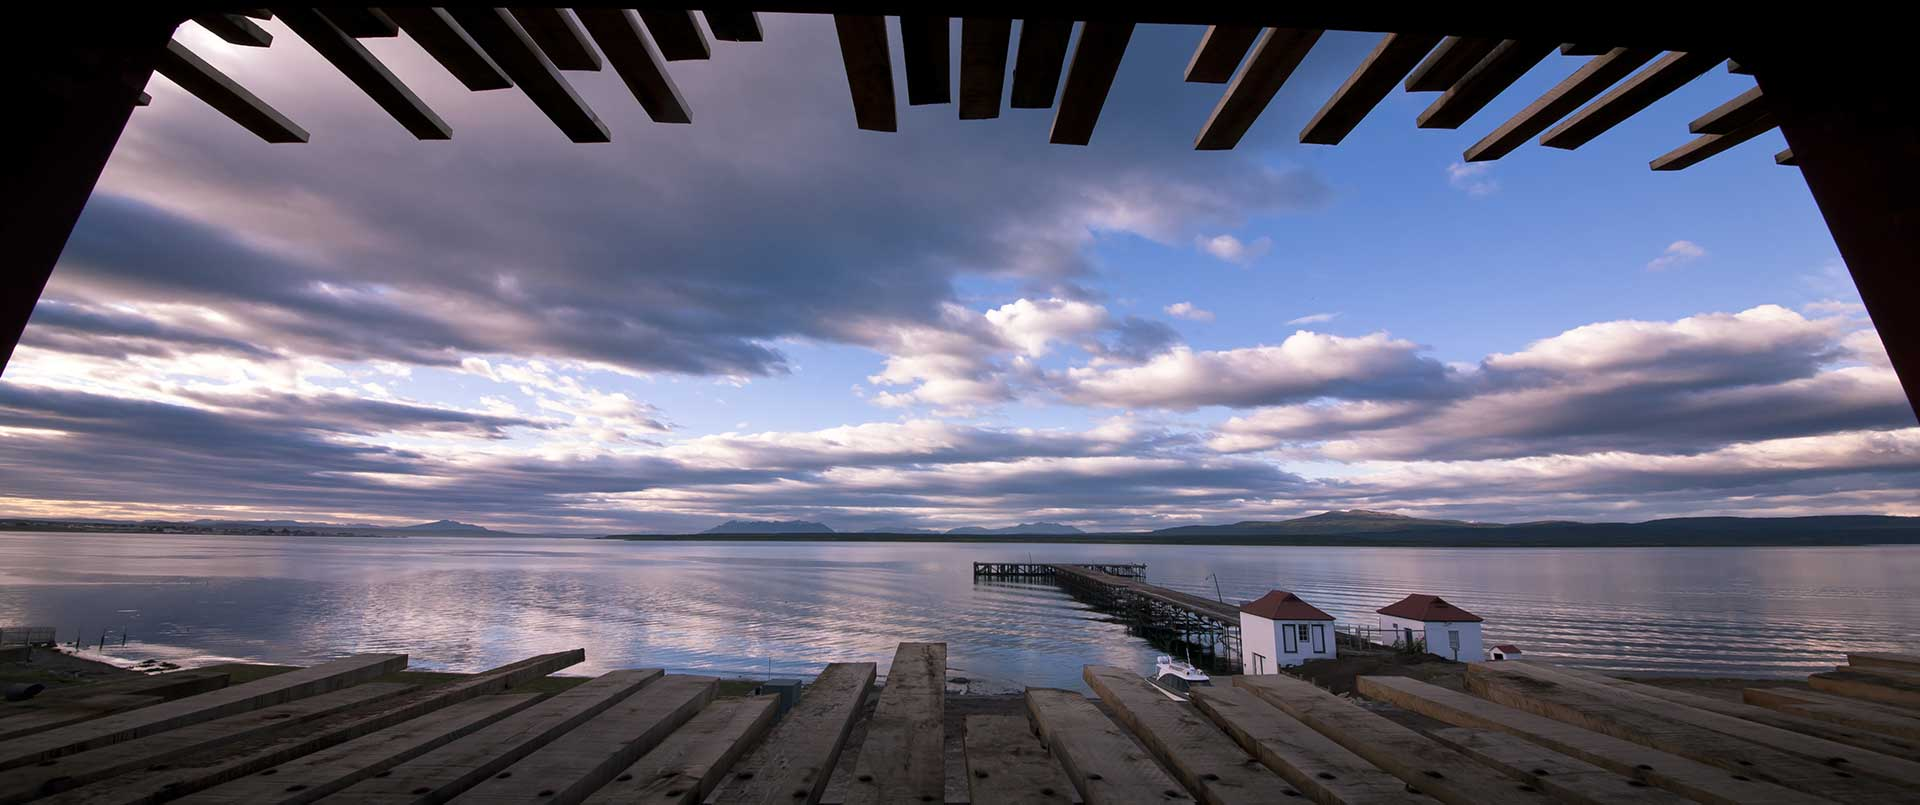 The Singular Patagonia, Puerto Bories